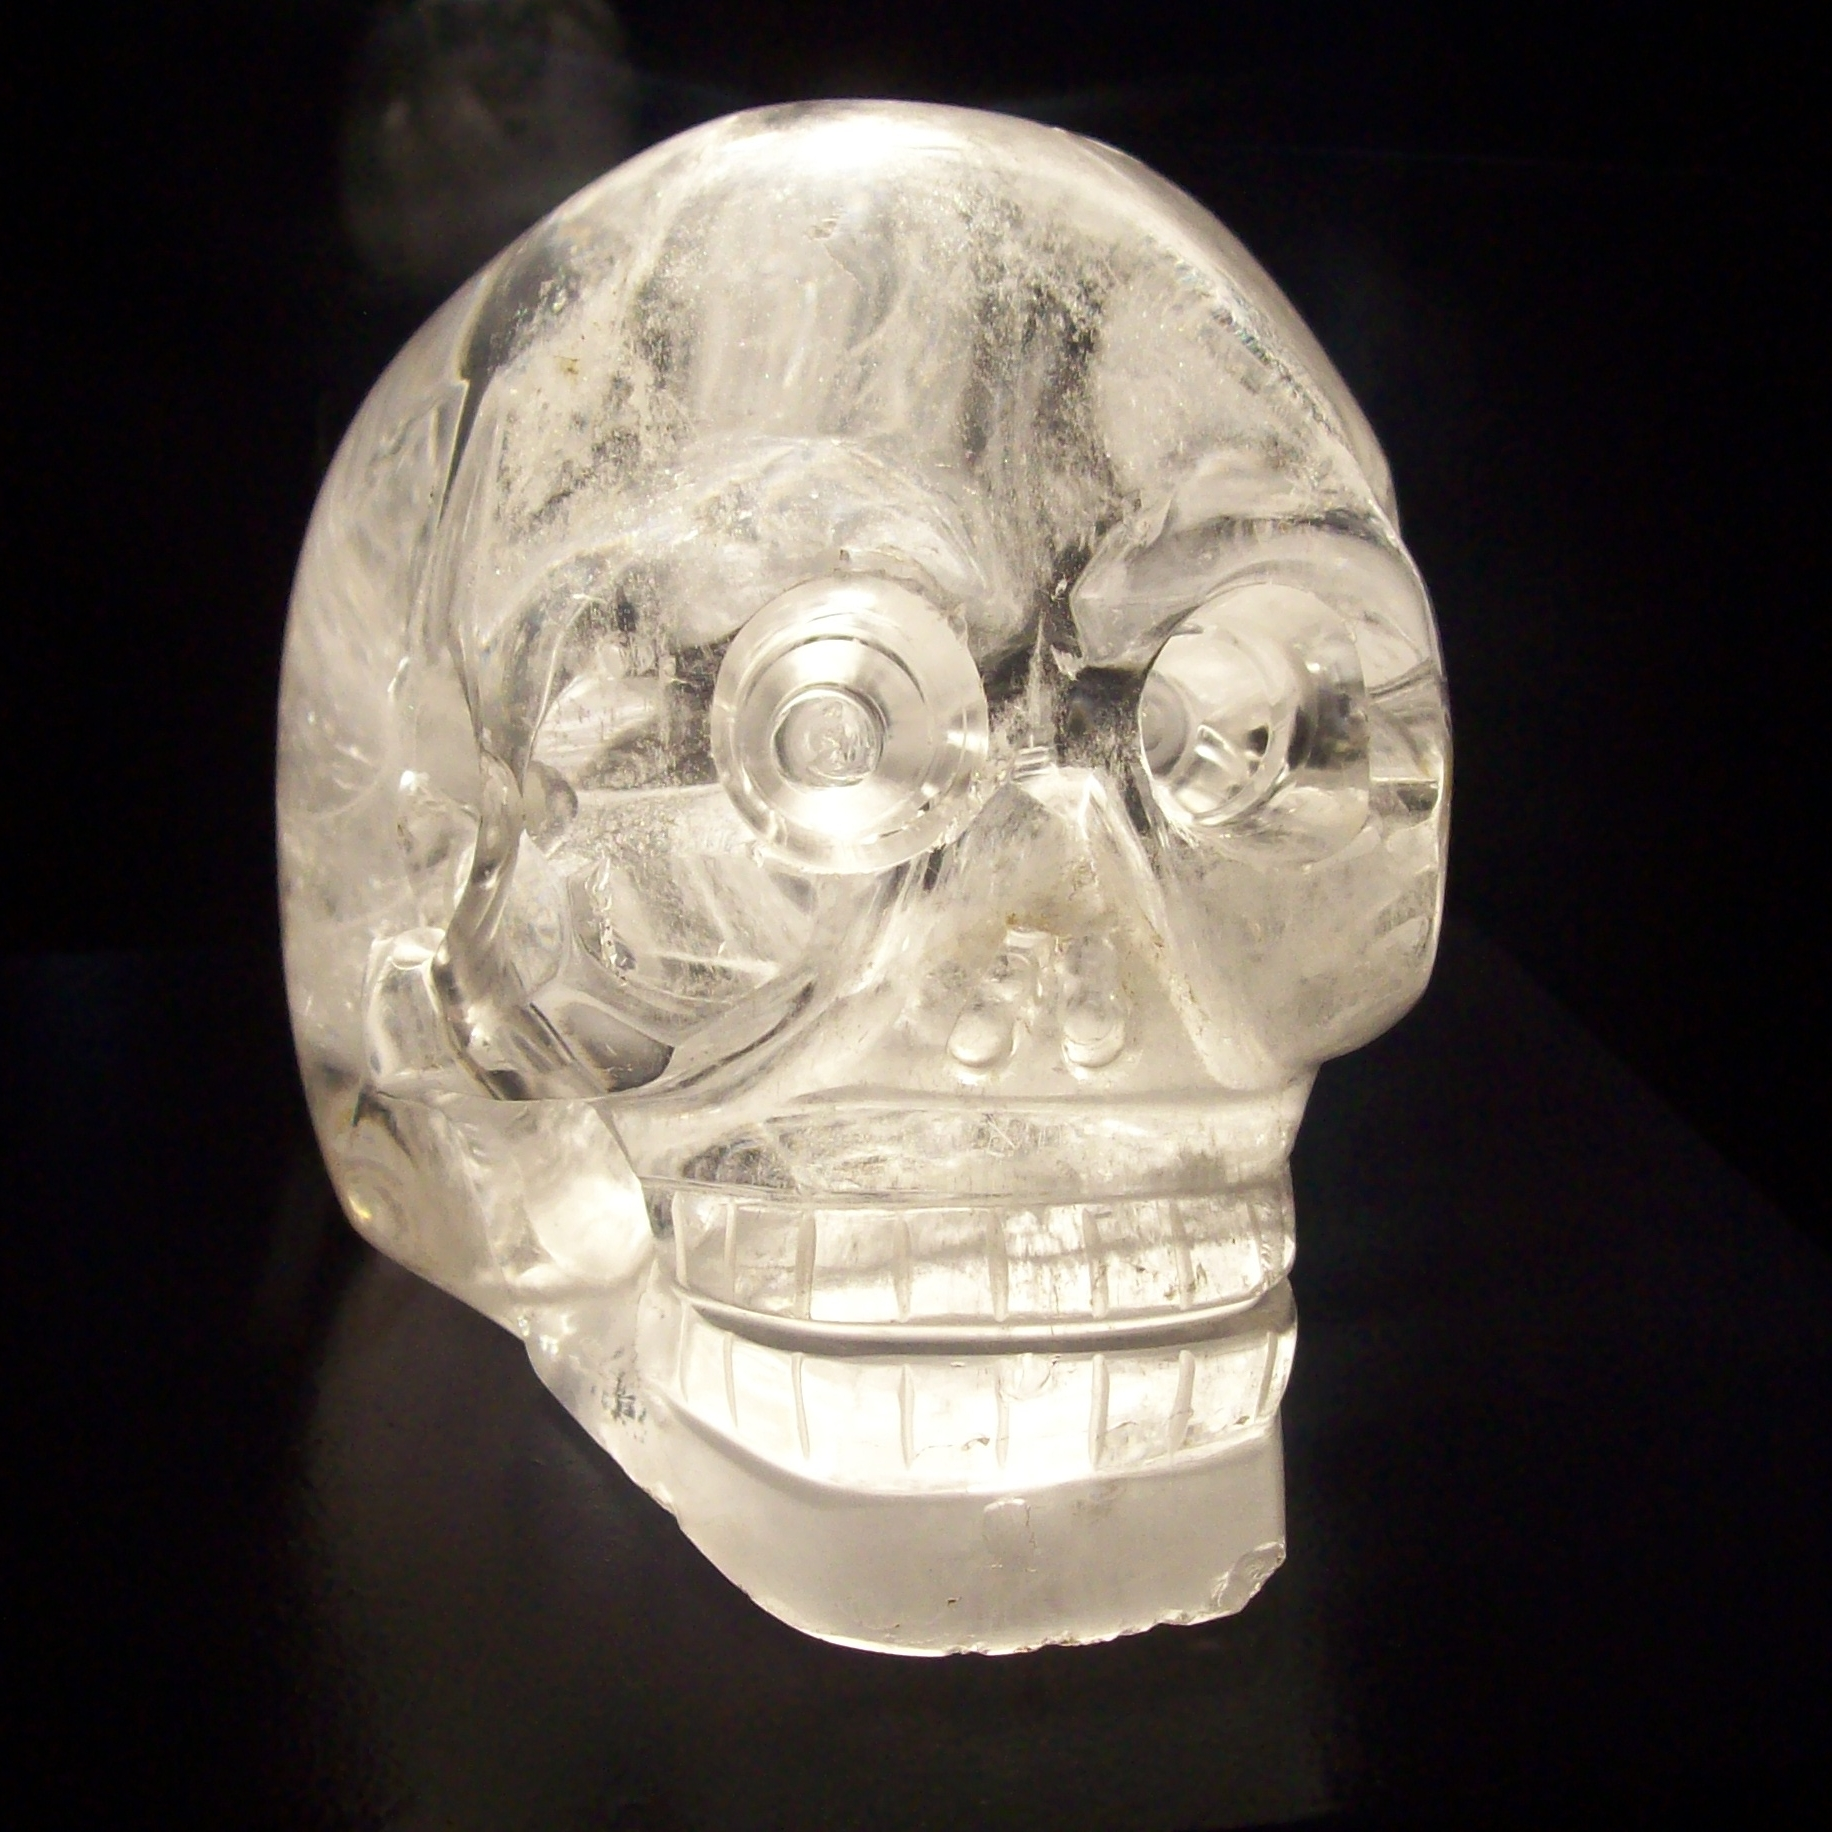 http://upload.wikimedia.org/wikipedia/commons/1/14/Crystal_skull_in_Mus%C3%A9e_du_quai_Branly%2C_Paris.jpg